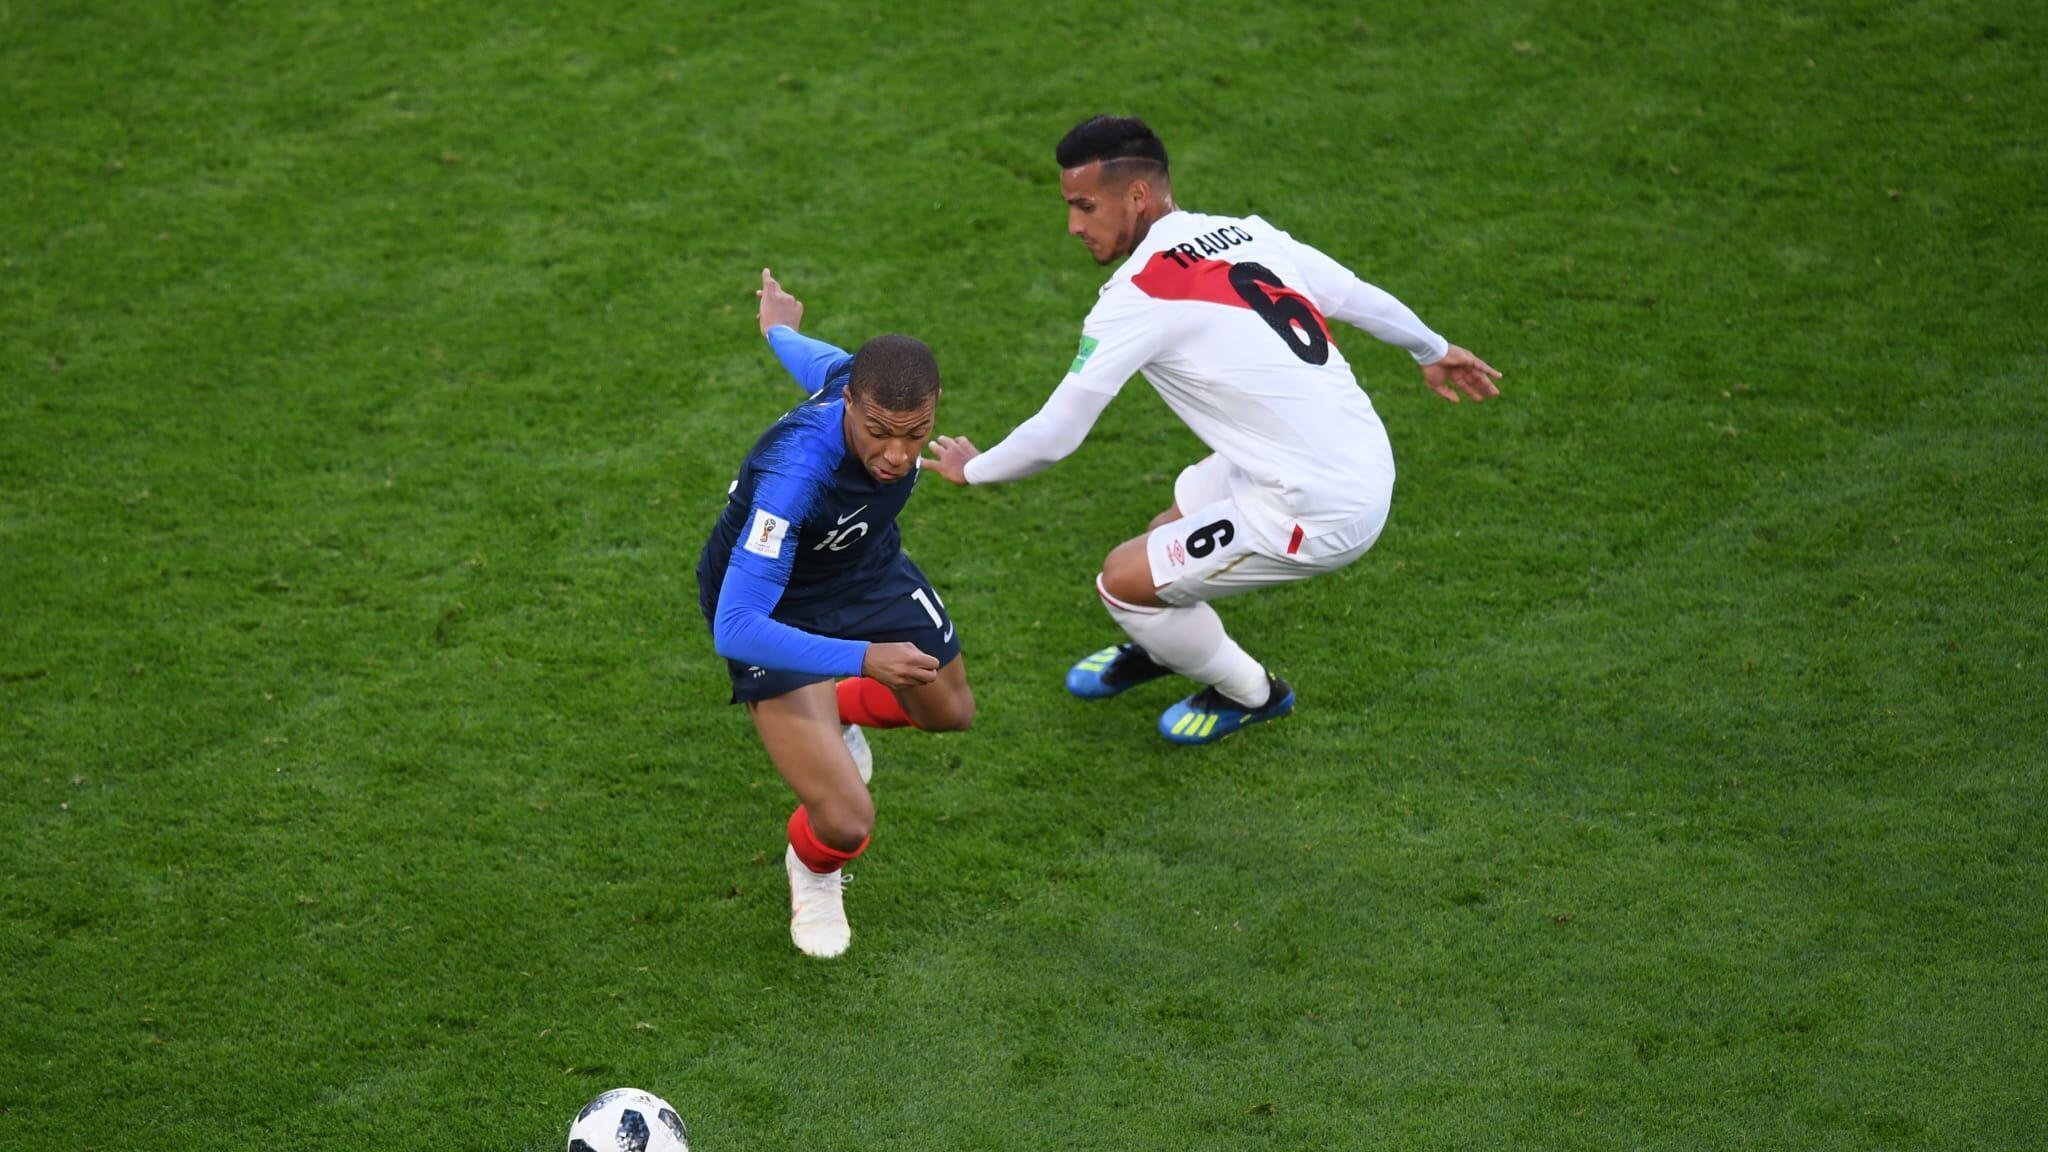 Preview Prancis vs Argetina: 3 Alasan Kenapa Kamu Bisa Jagokan Prancis